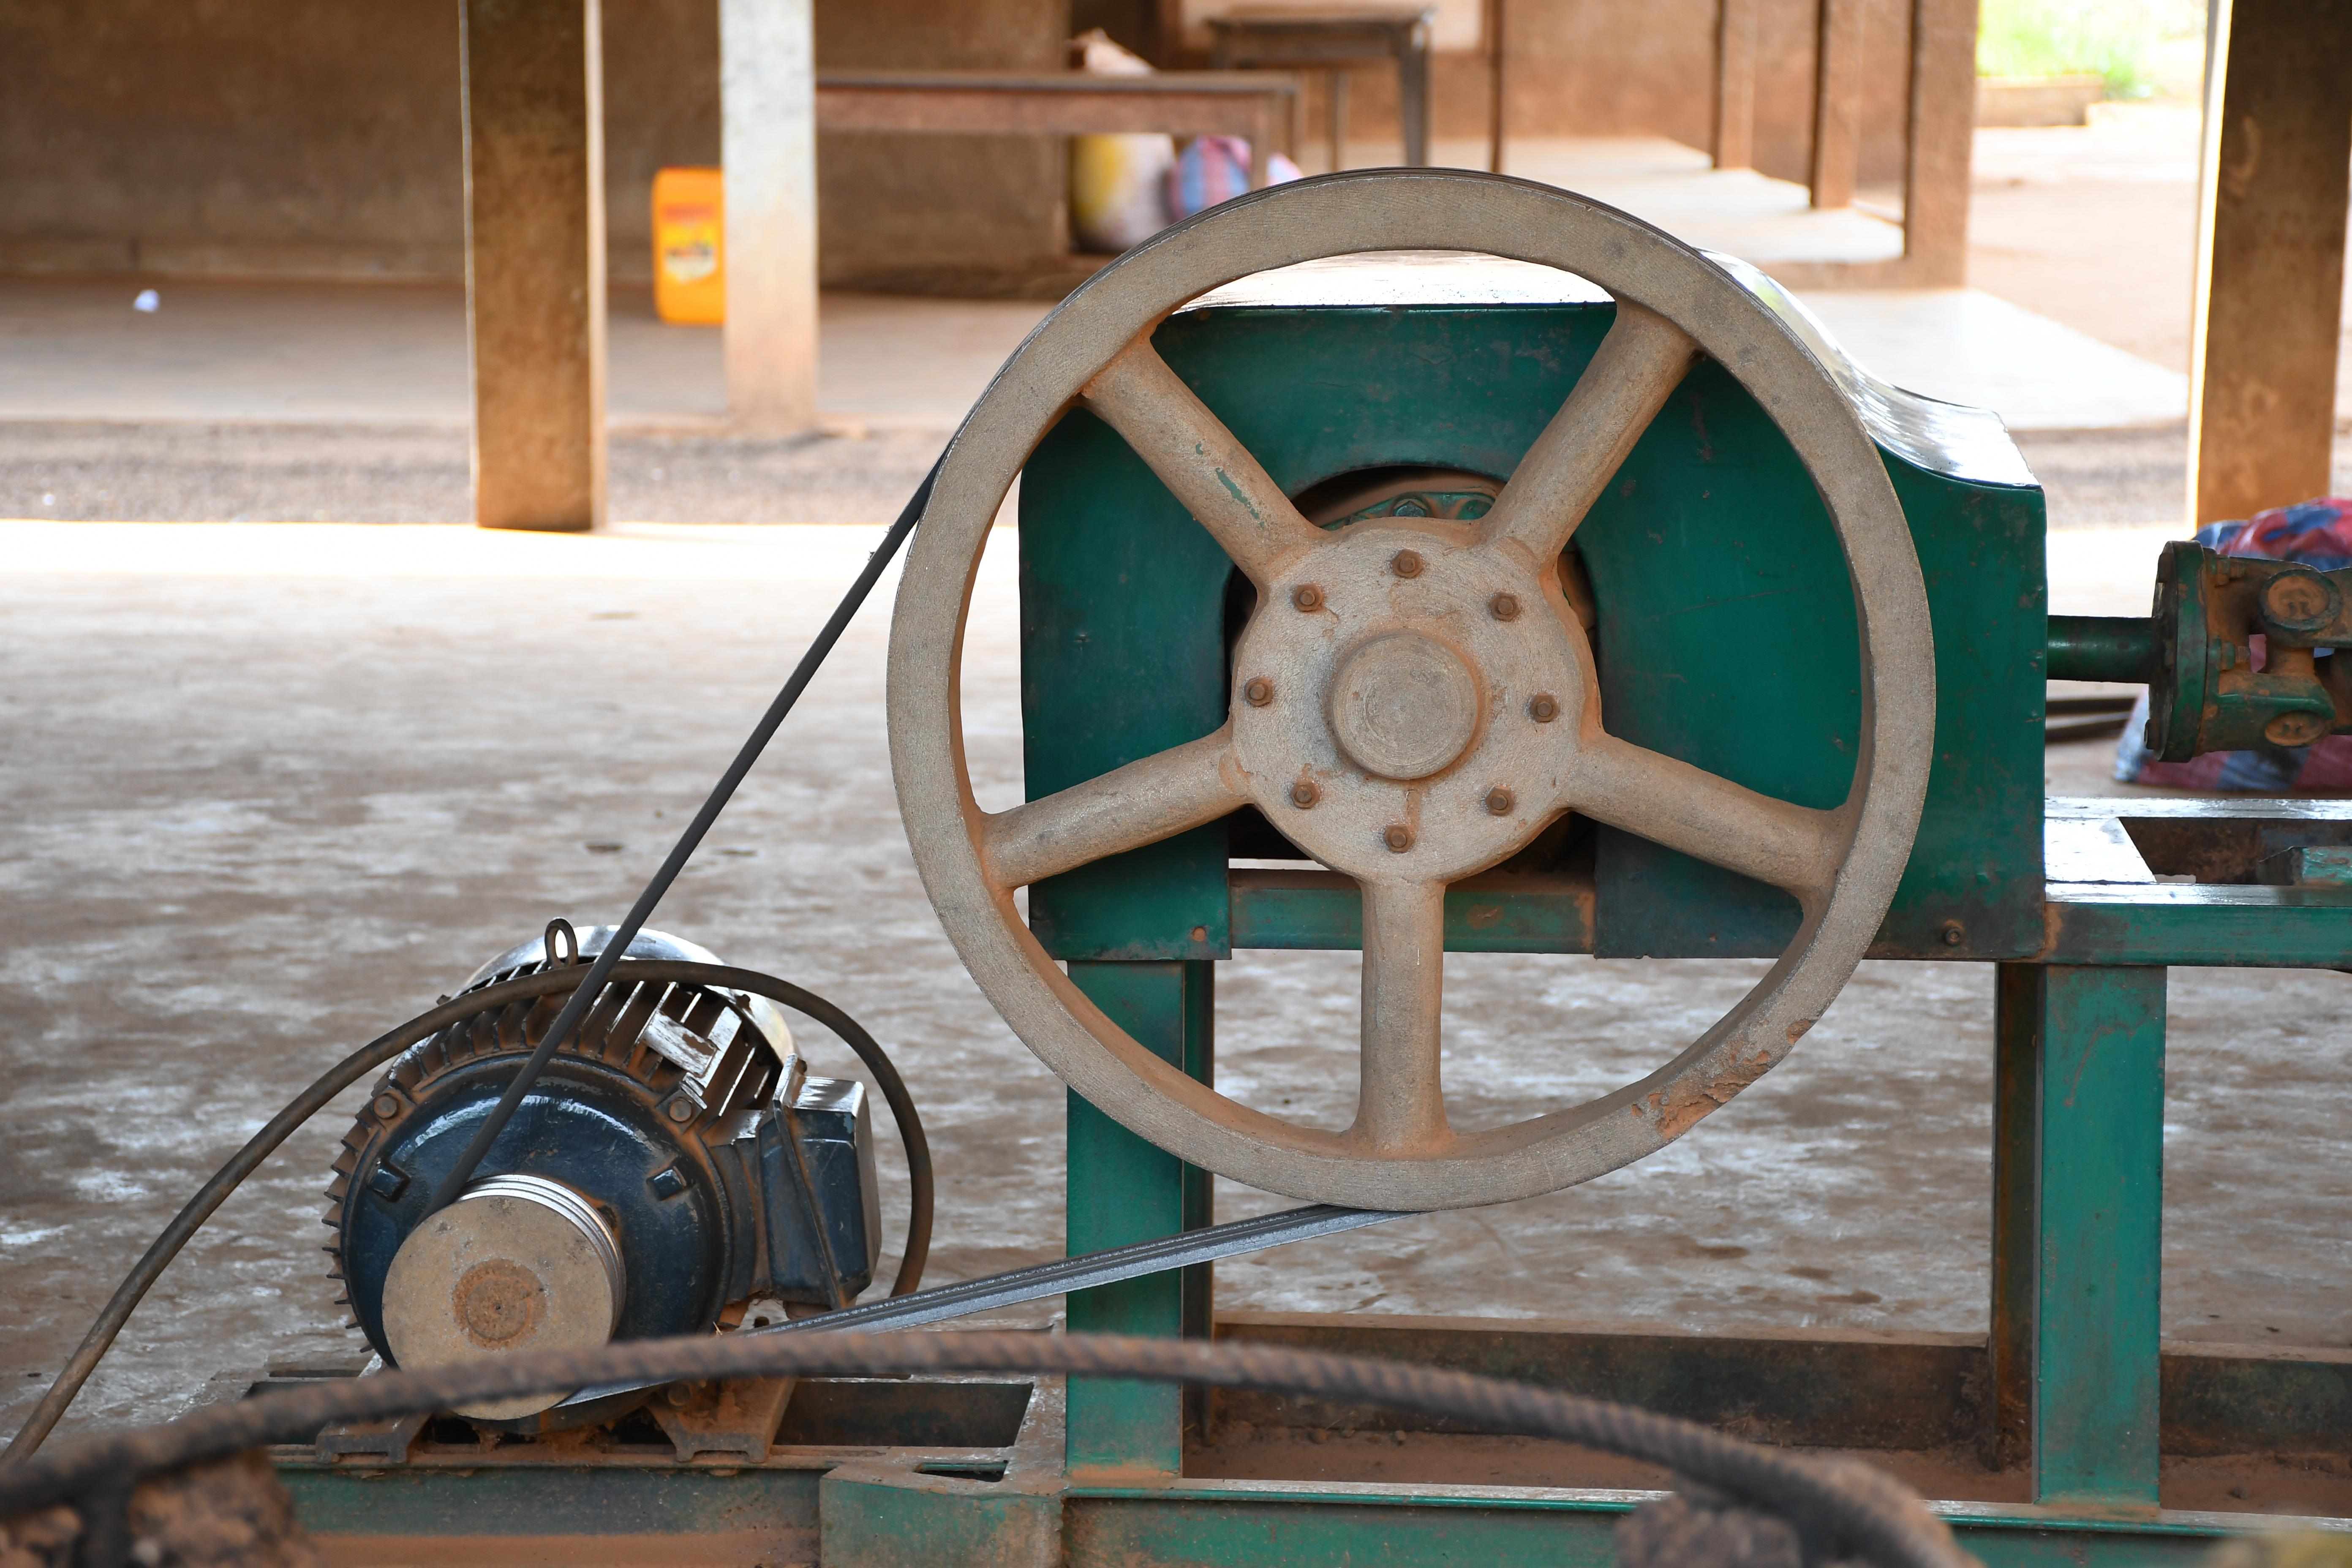 Photo by Tyck | machine, mechanical, grinding wheel